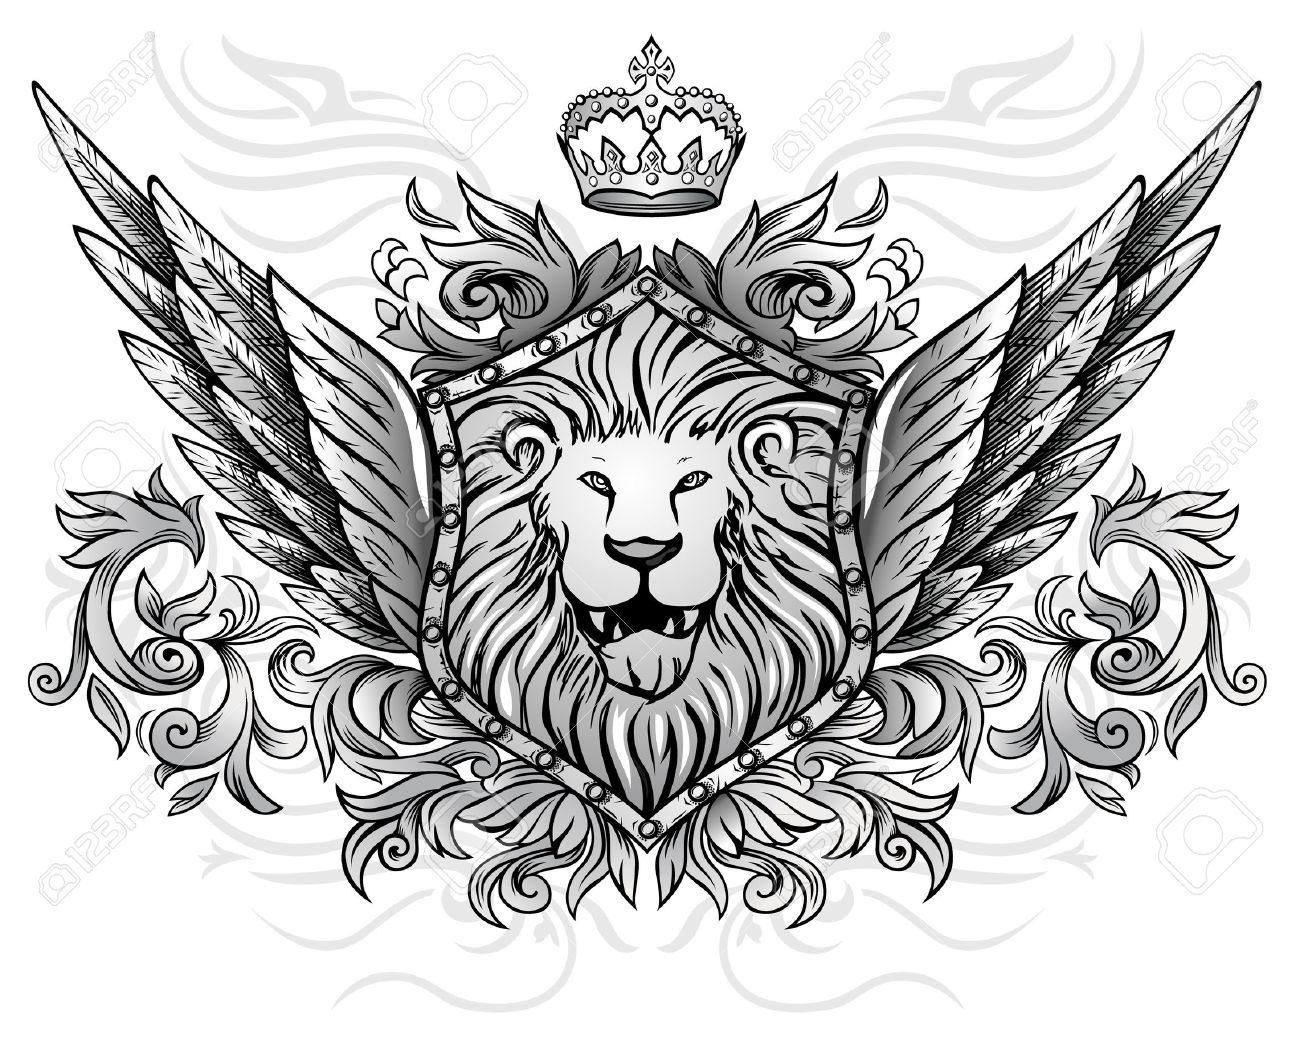 Winged lion tattoo - photo#53